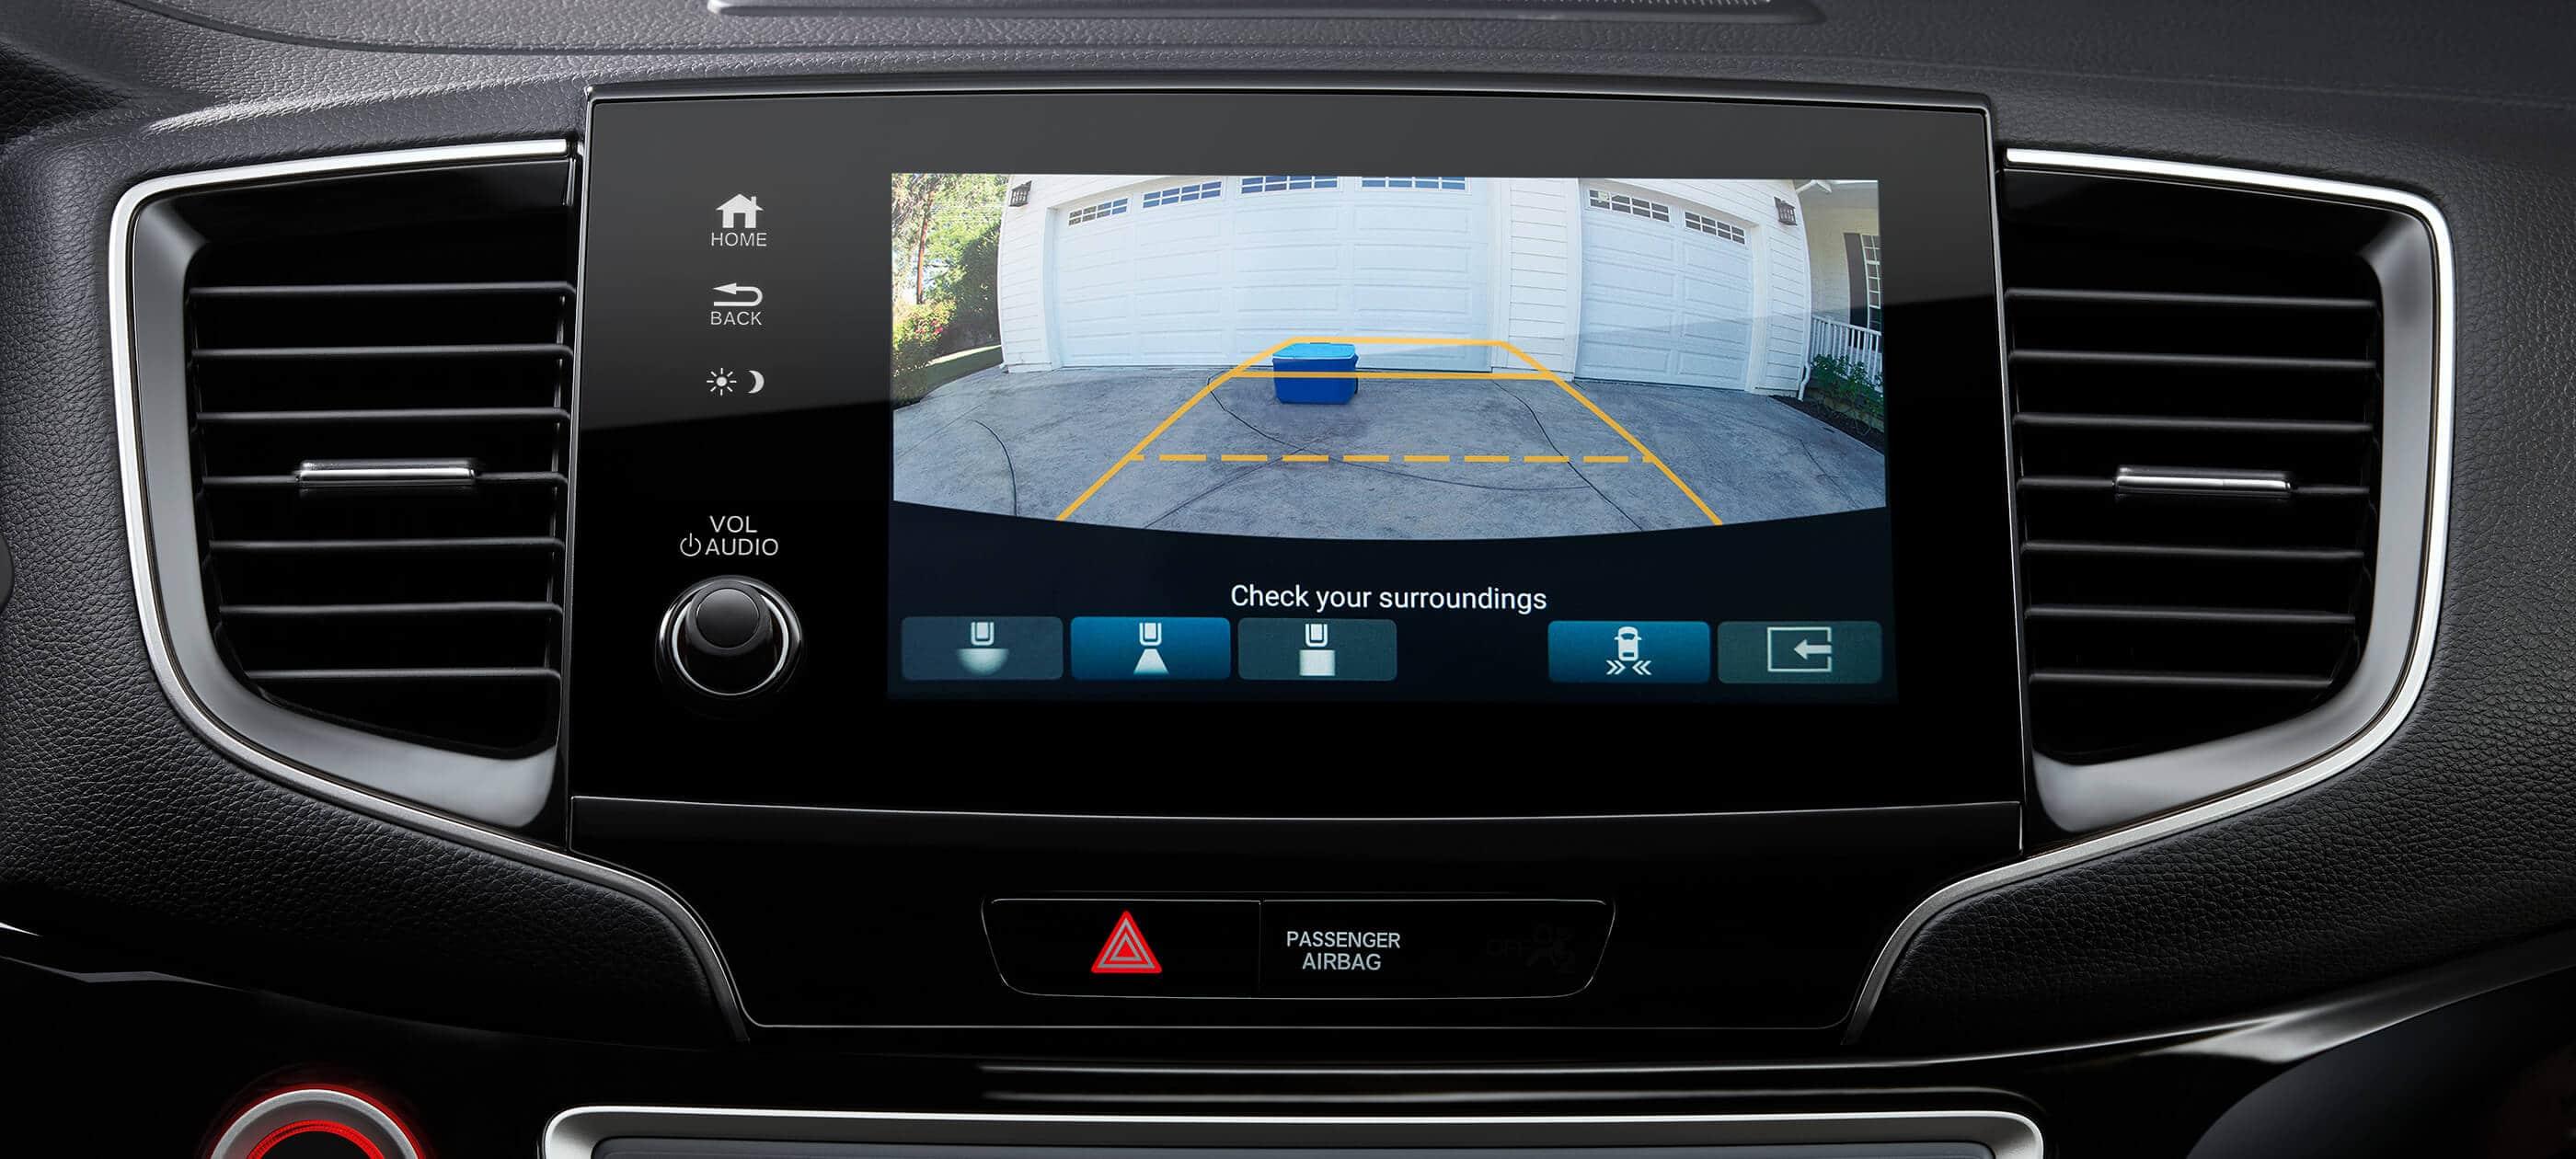 2019 Honda Pilot | Jamestown Honda | Modern Family SUV